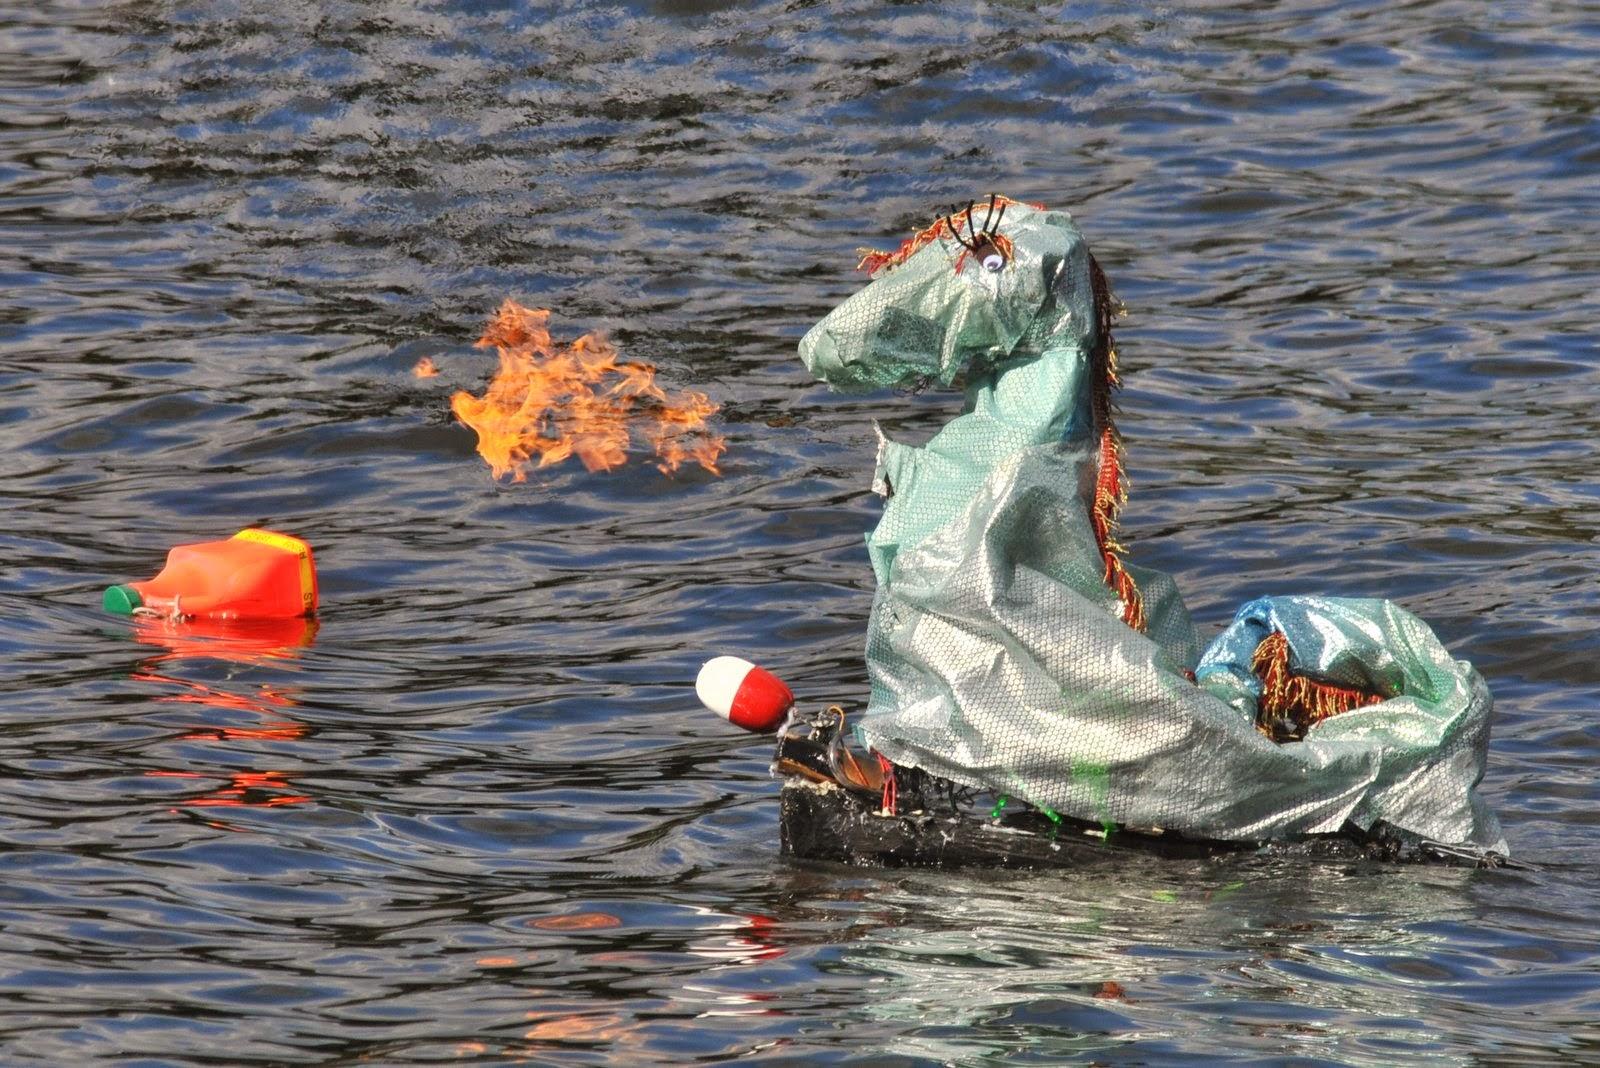 Robot Sea Monsters Light Targets on Fire on Lake Champlain